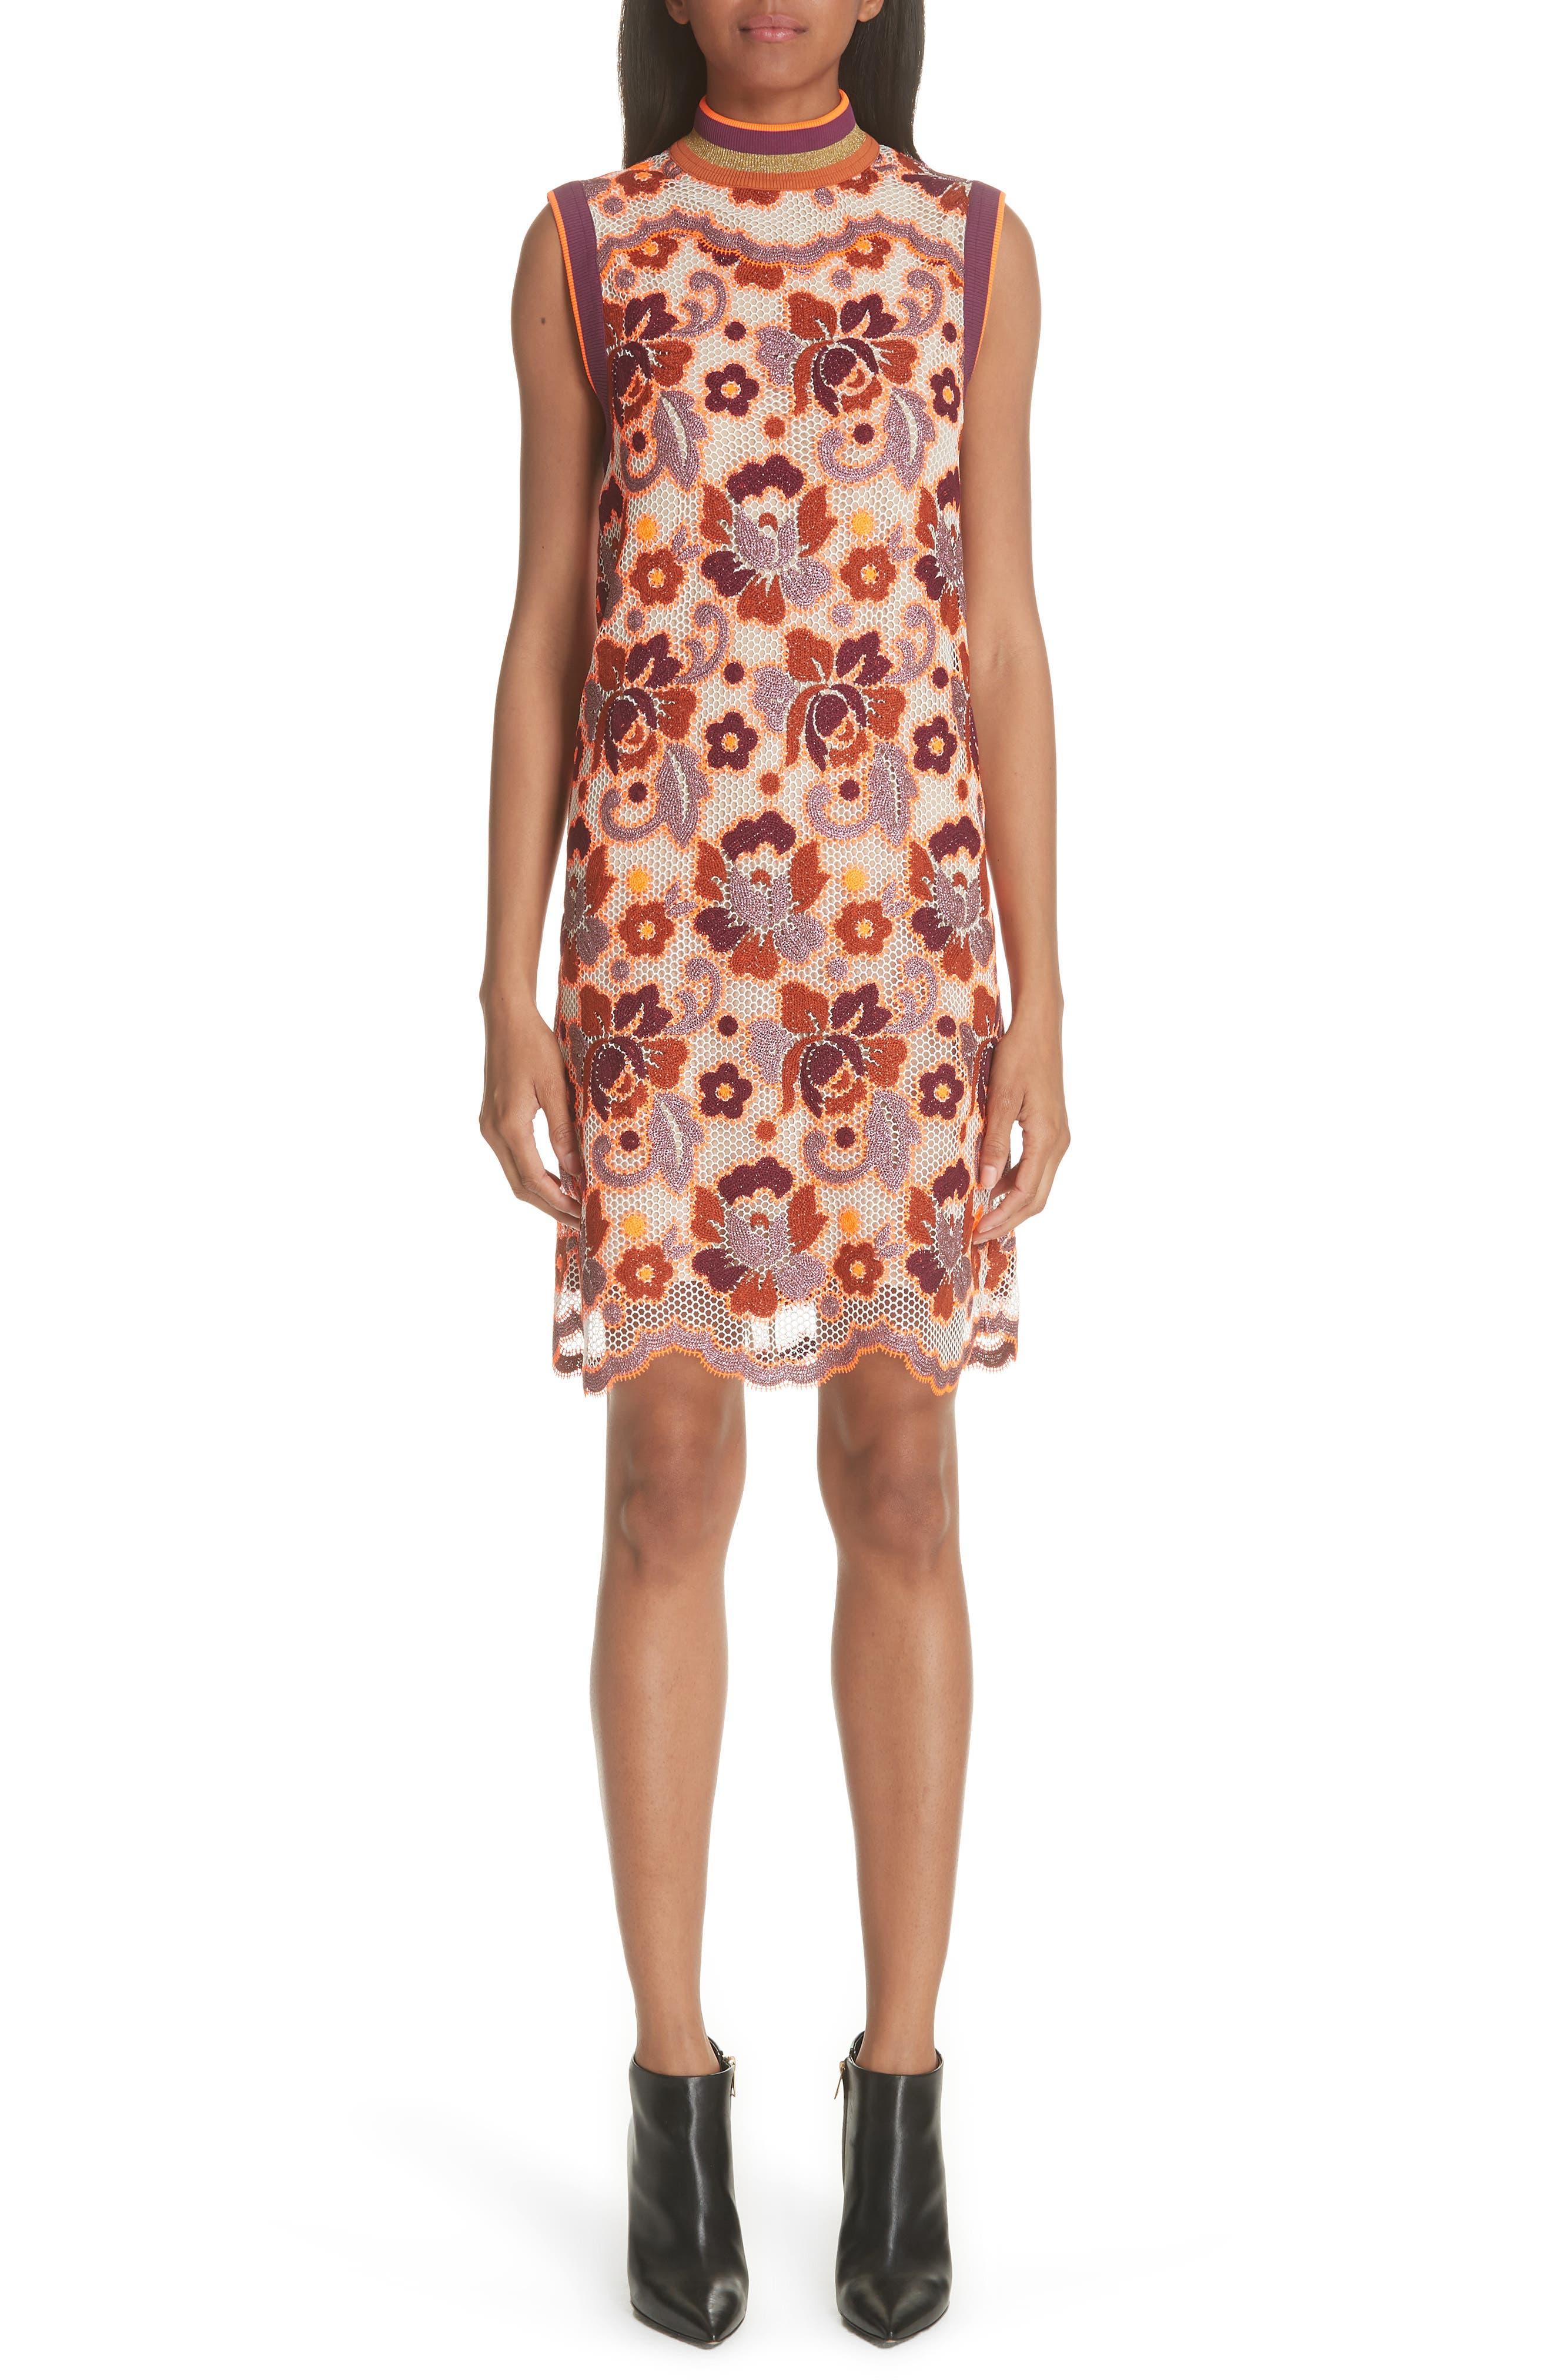 Burberry Edna Floral Crochet Shift Dress, 8 IT - Orange